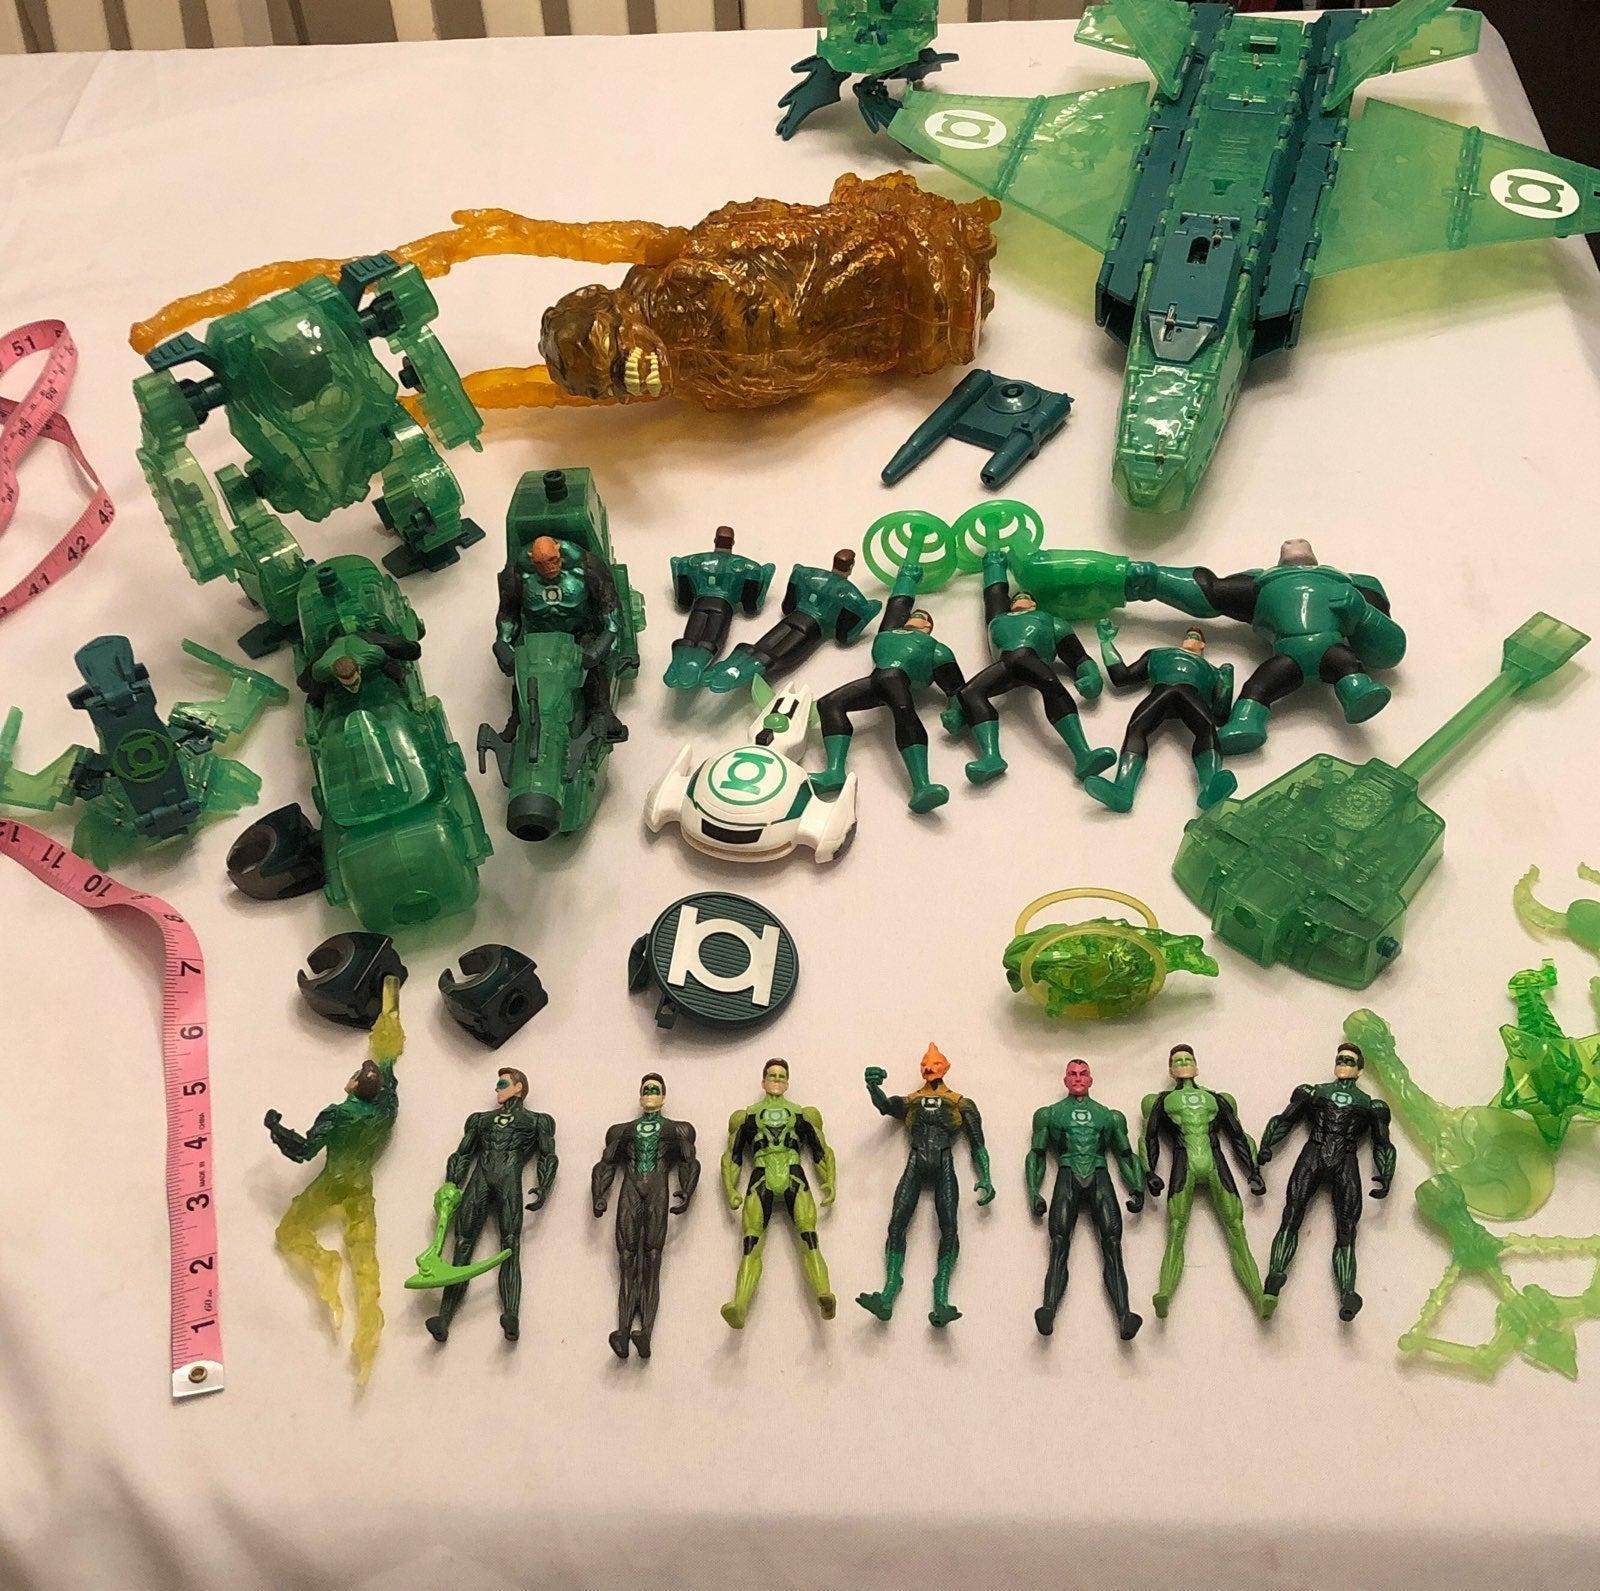 Lots of Green lantern toys, mini figure